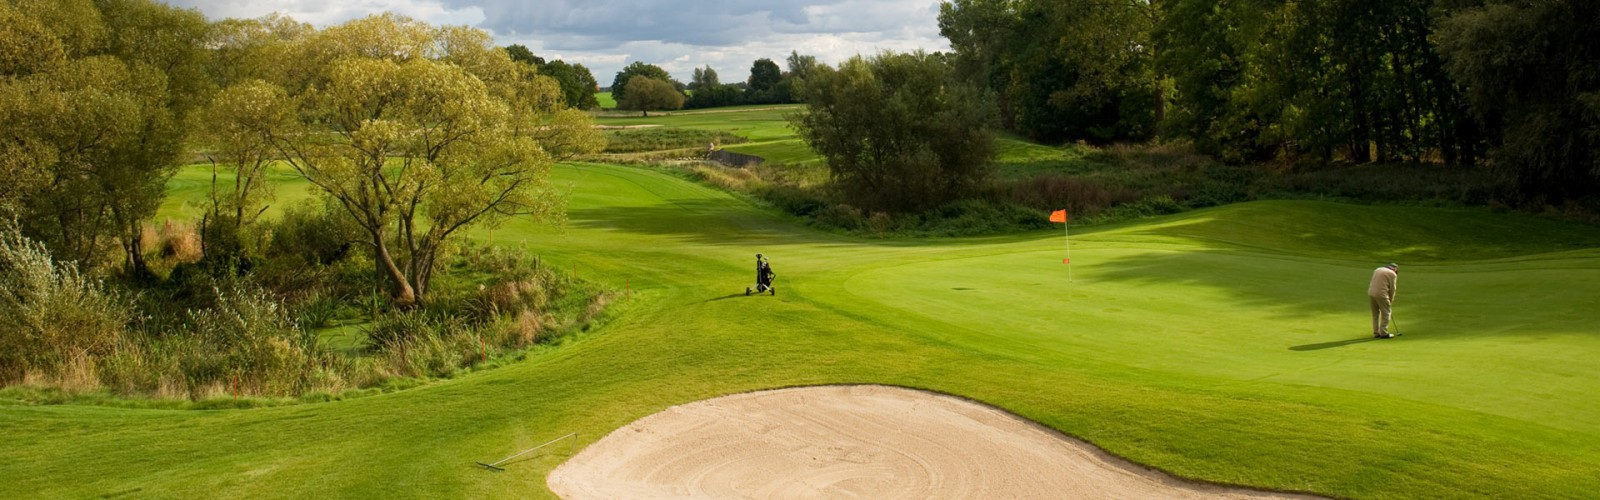 Golfplatz Mecklenburg-Vorpommern im Golfhotel Strelasund